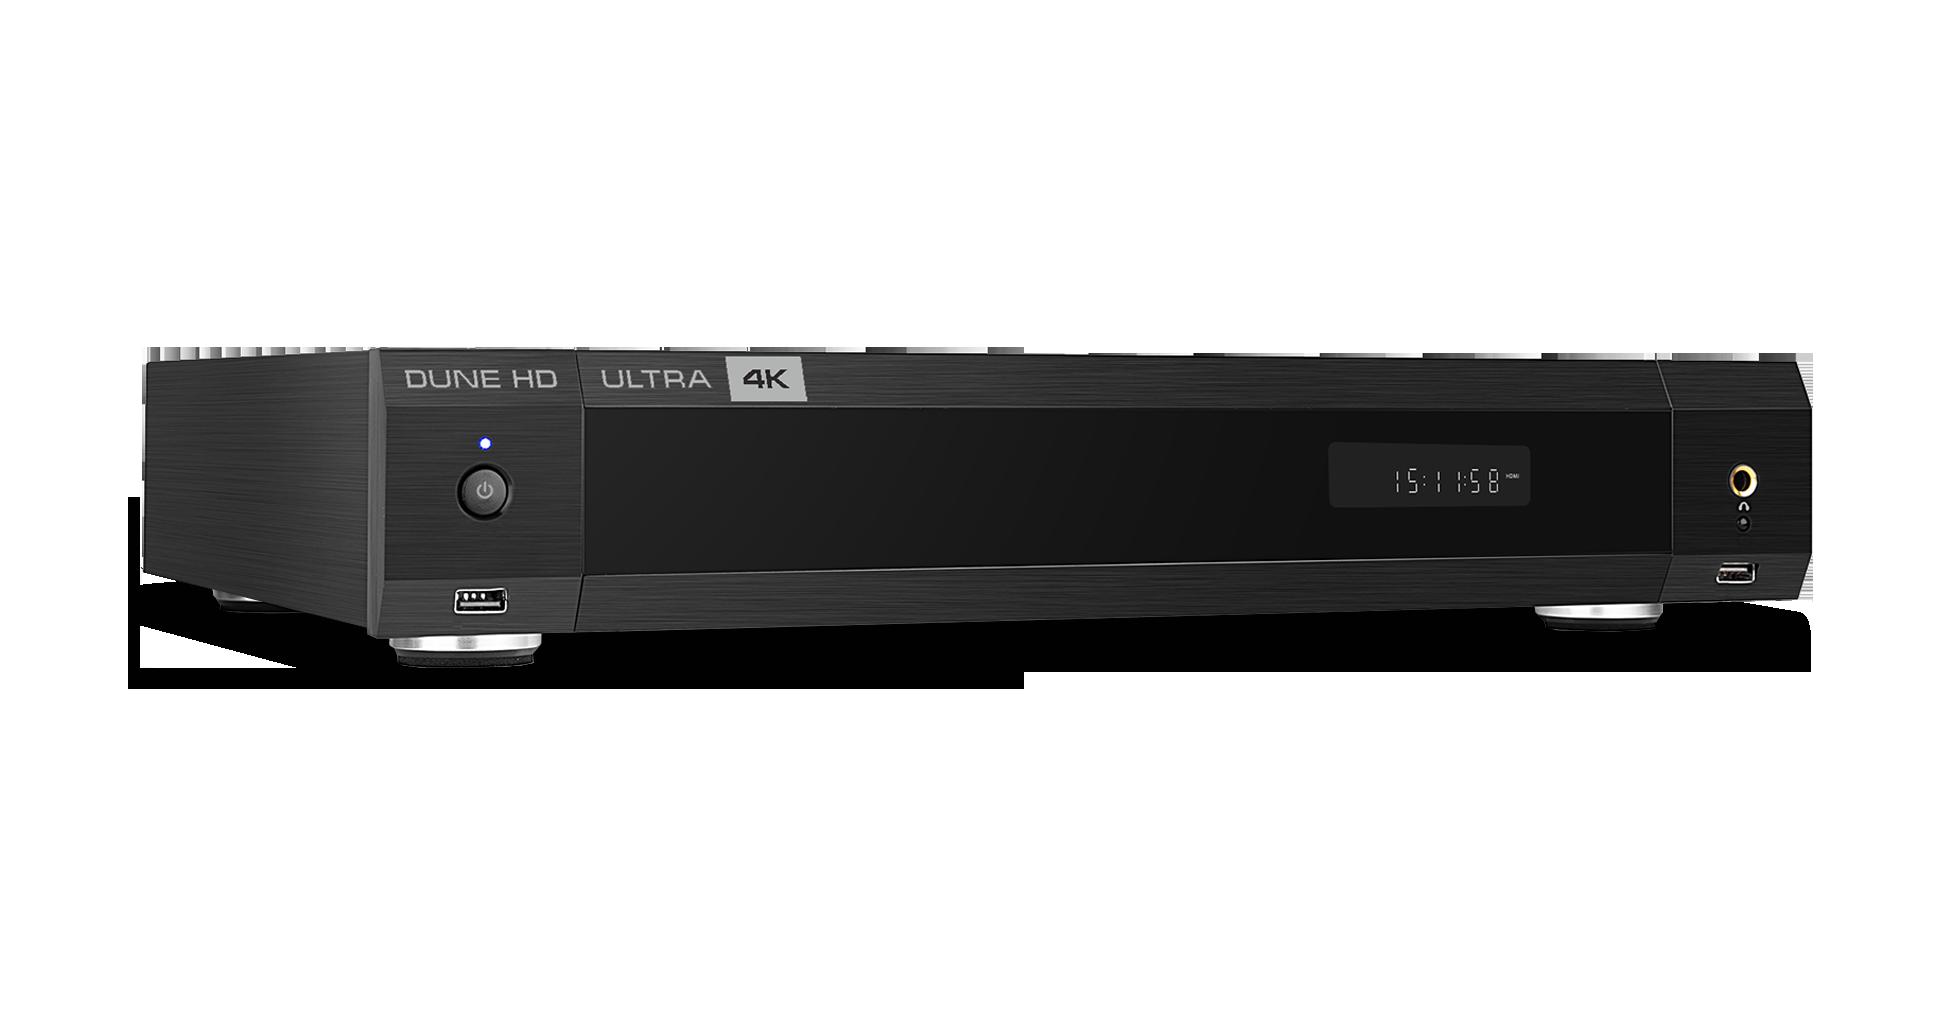 Dune HD Ultra 4K (PRE ORDER)